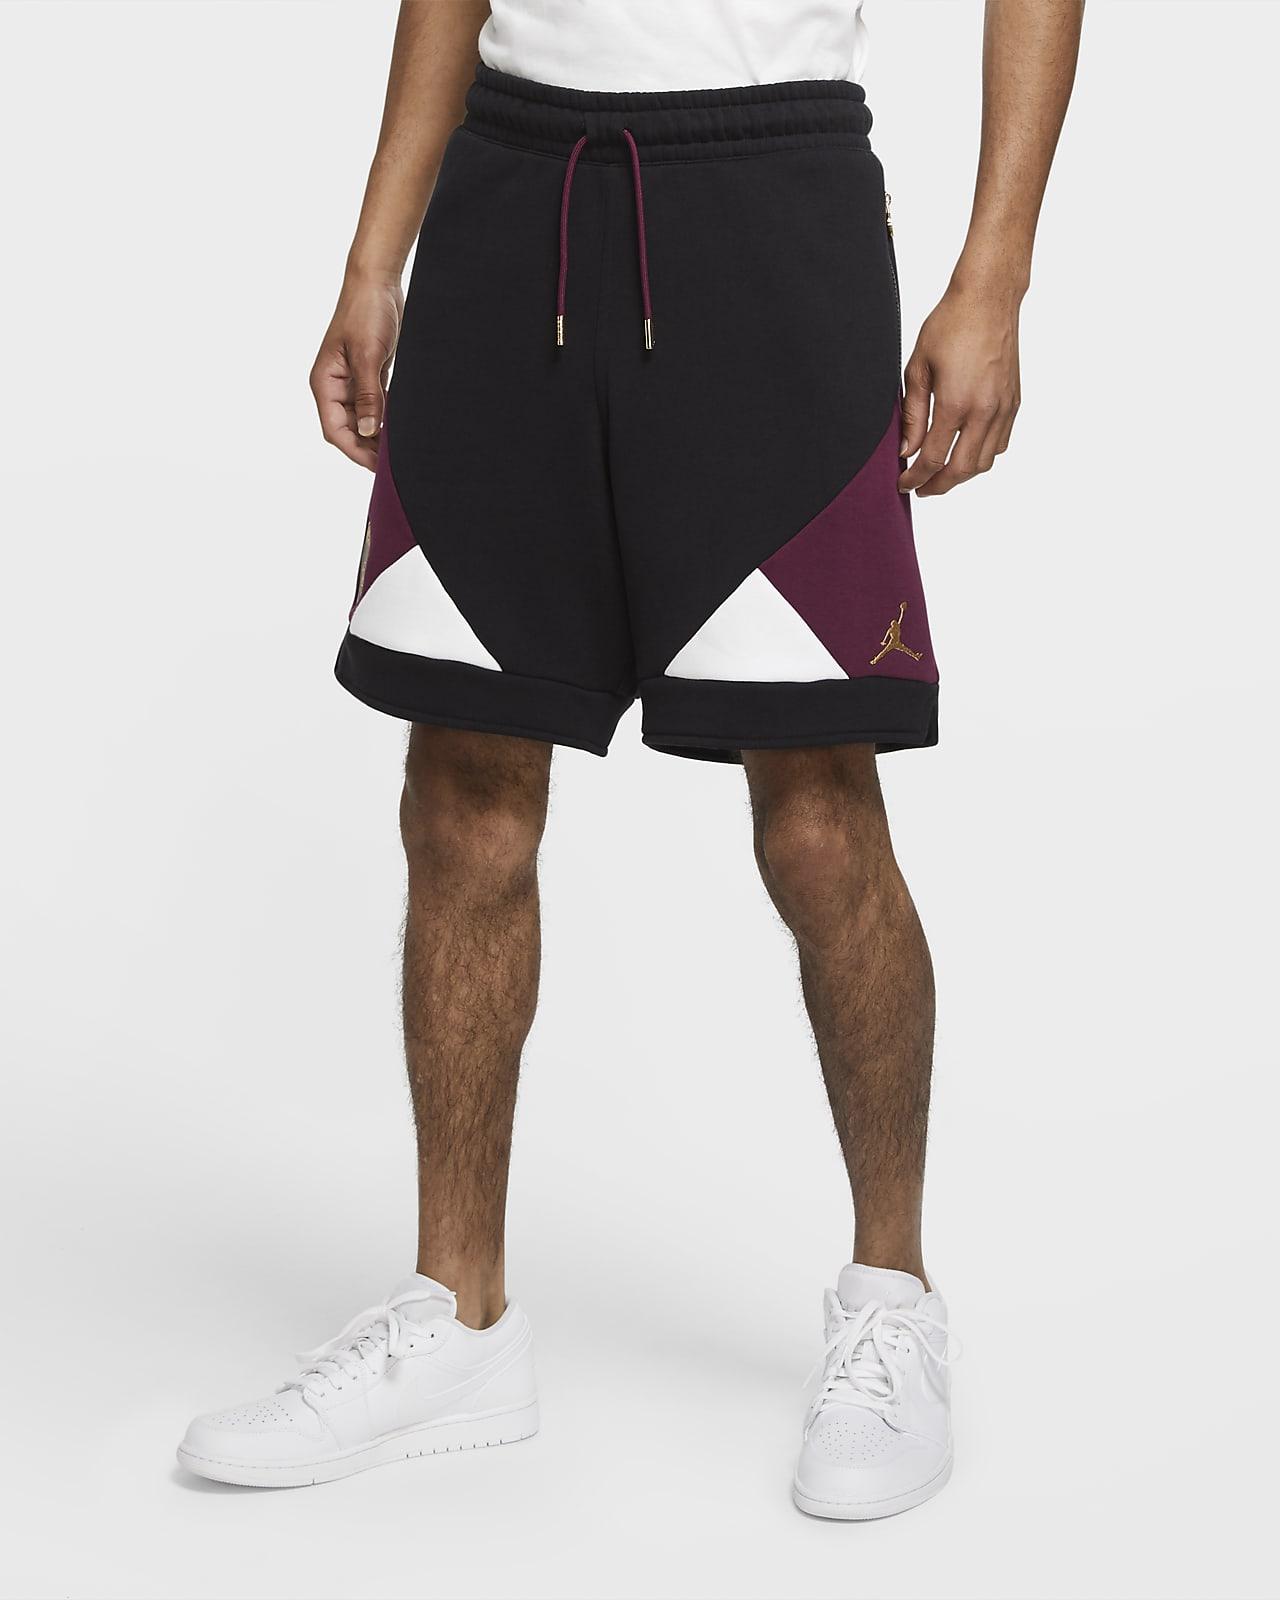 Shorts para hombre Paris Saint-Germain